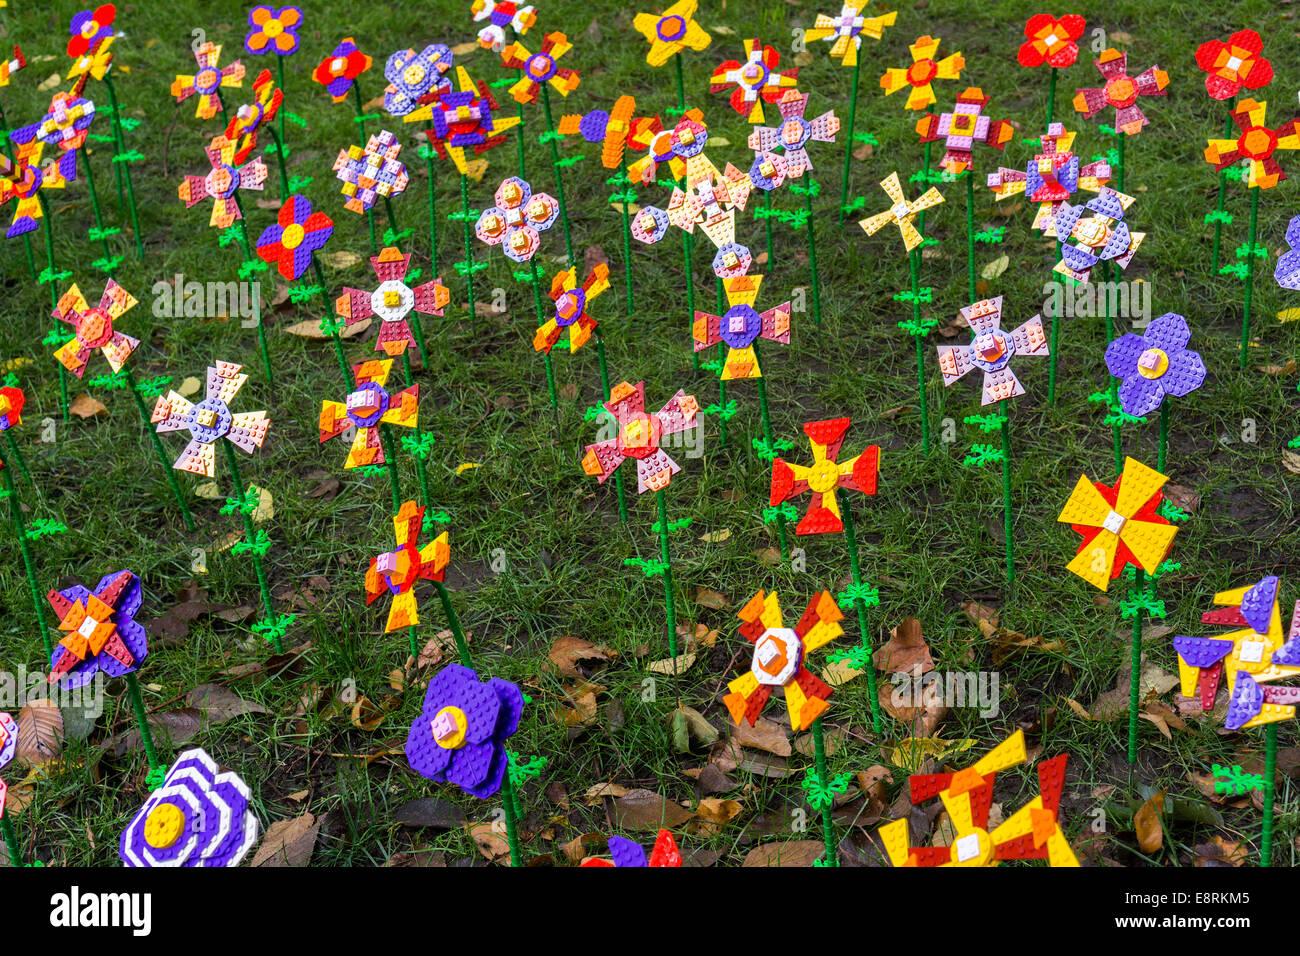 Lego store new york stock photos lego store new york - Parking garages near madison square garden ...